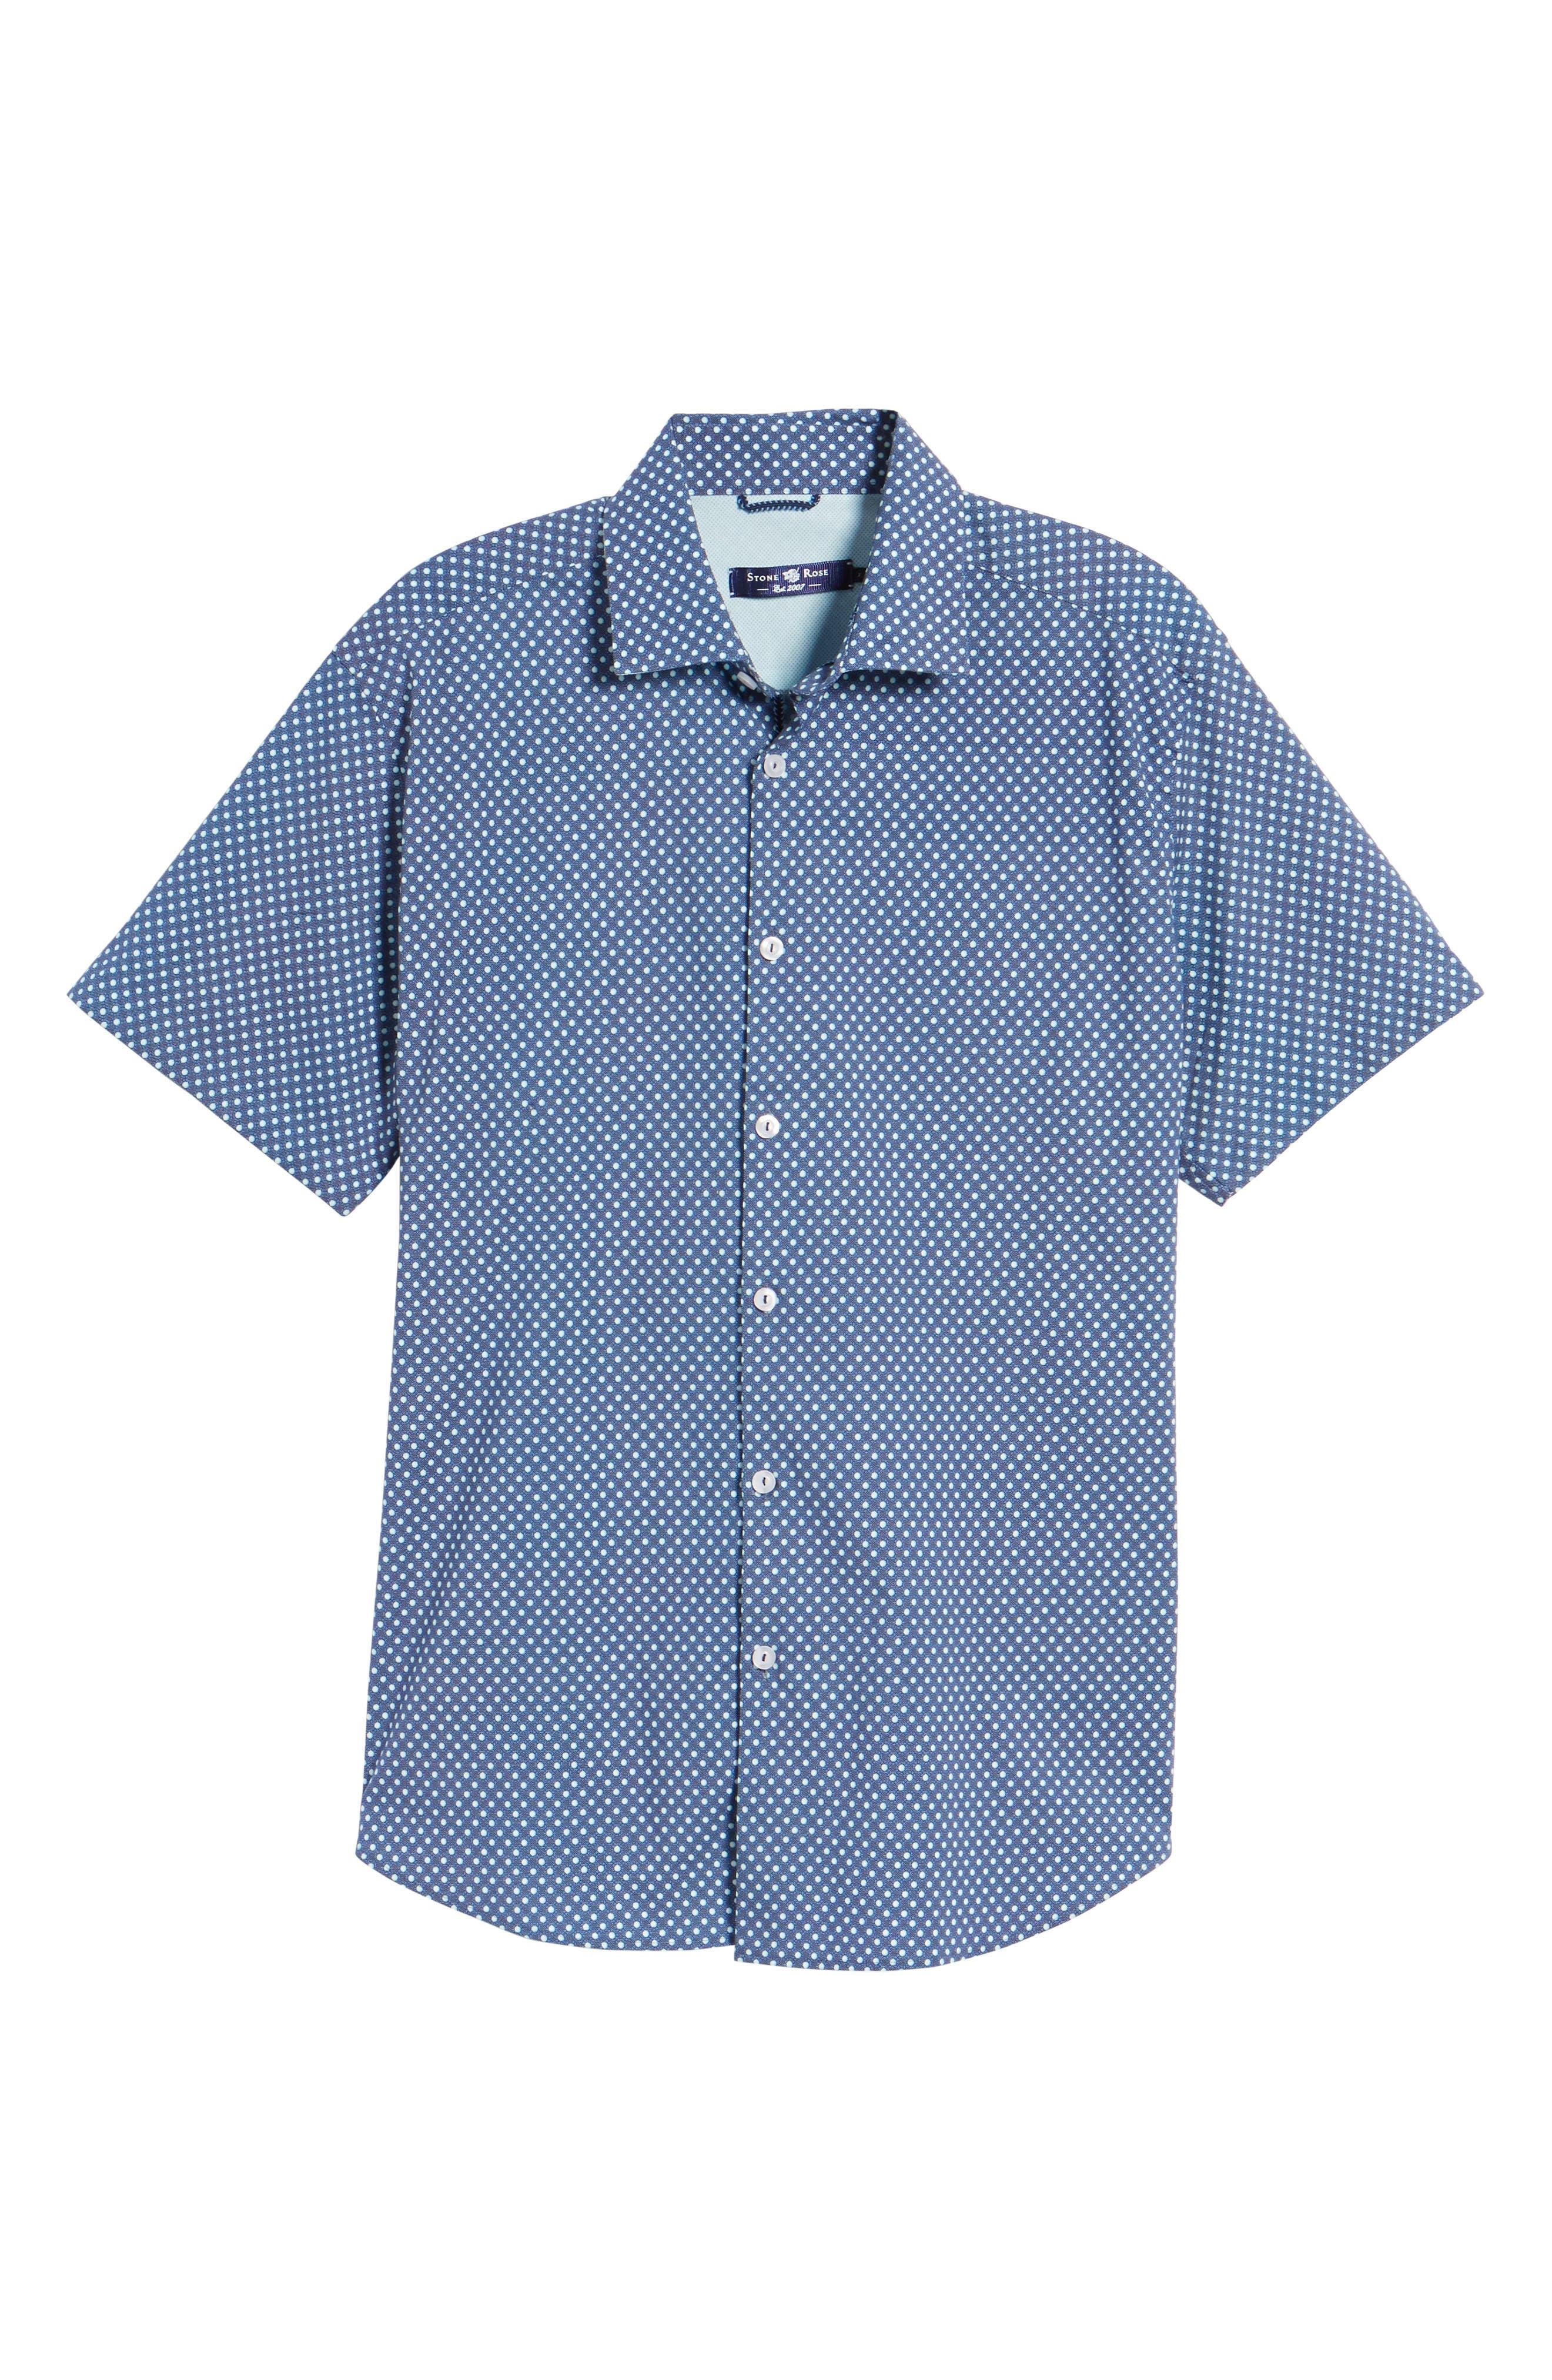 Woven Sport Shirt,                             Alternate thumbnail 6, color,                             NAVY